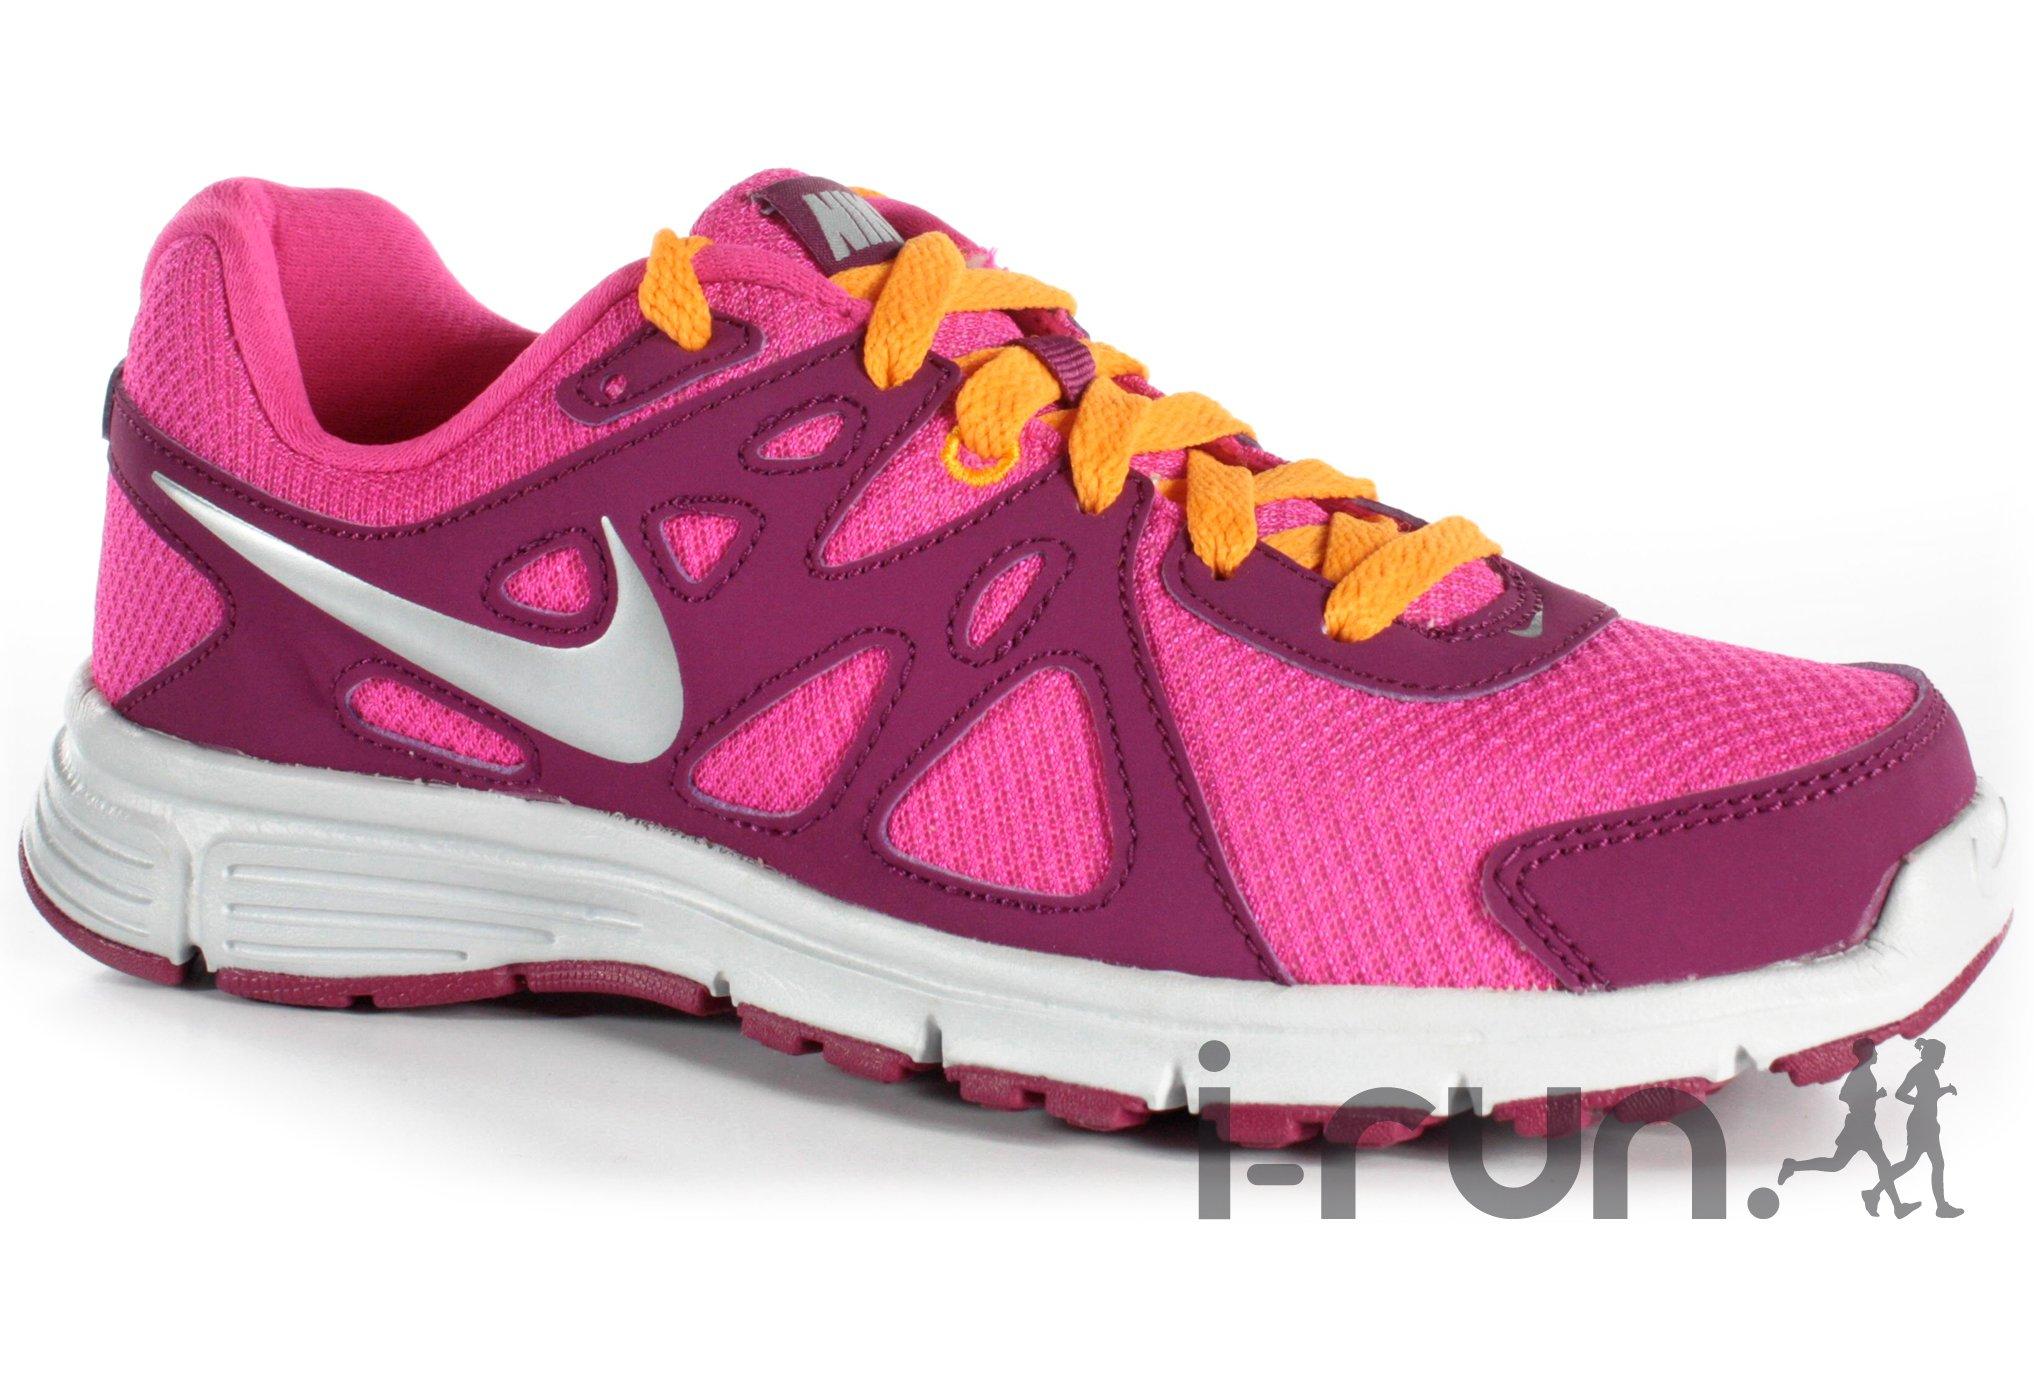 04bca34037 Nike Revolution 2 MLS W femme pas cher